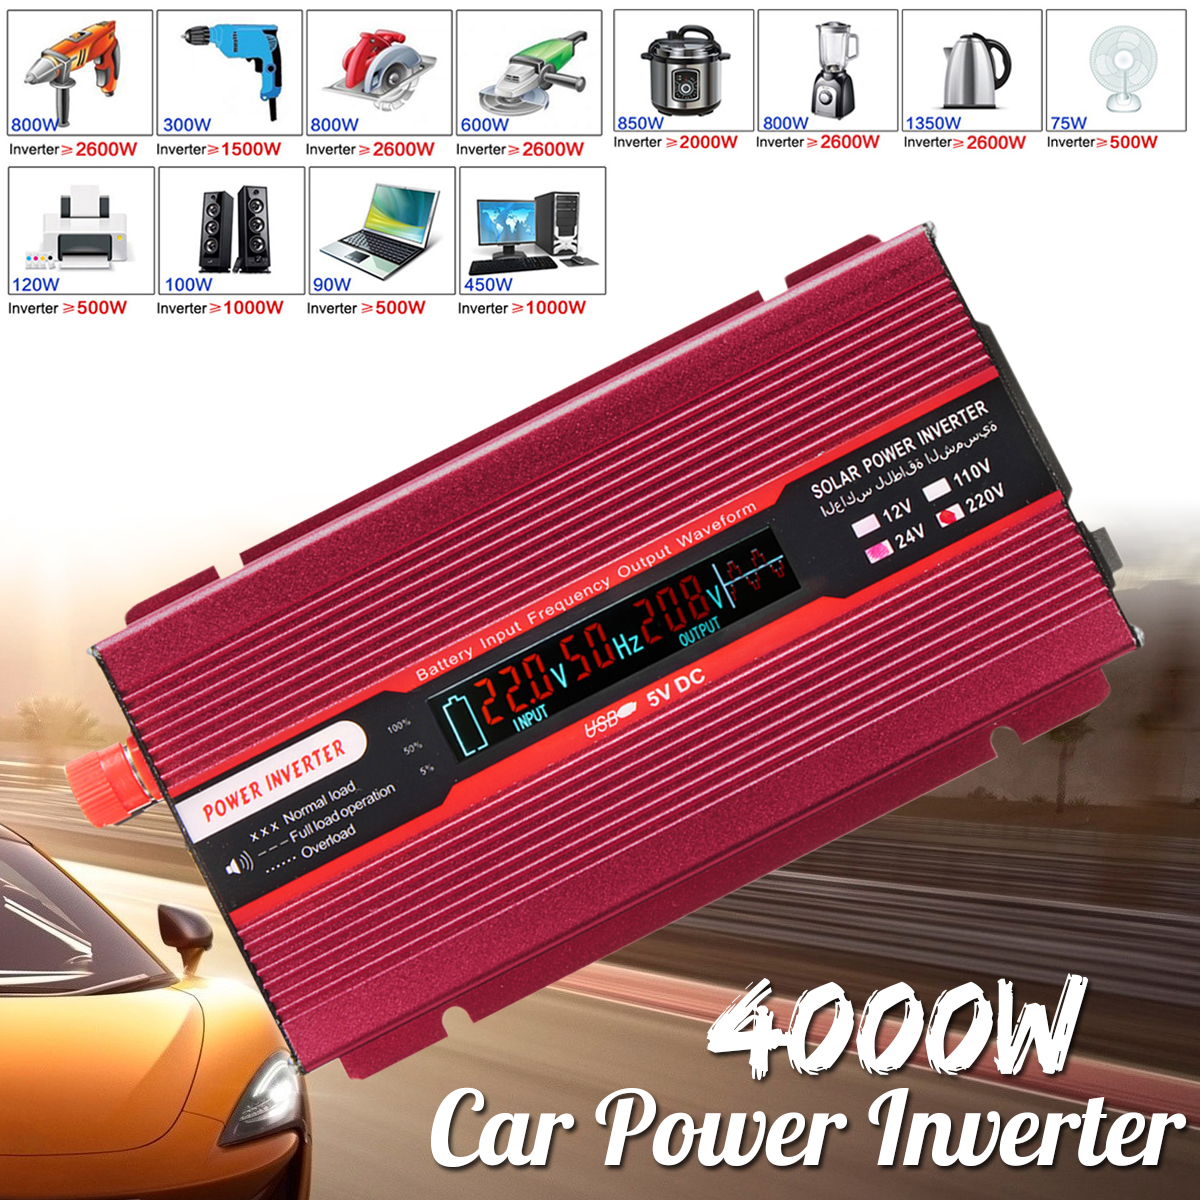 Voltage Transformer Car Power Inverter 12/24V To AC 220/110V PEAK 4000W USB Modified Sine Wave Converter Low Noise Aluminum